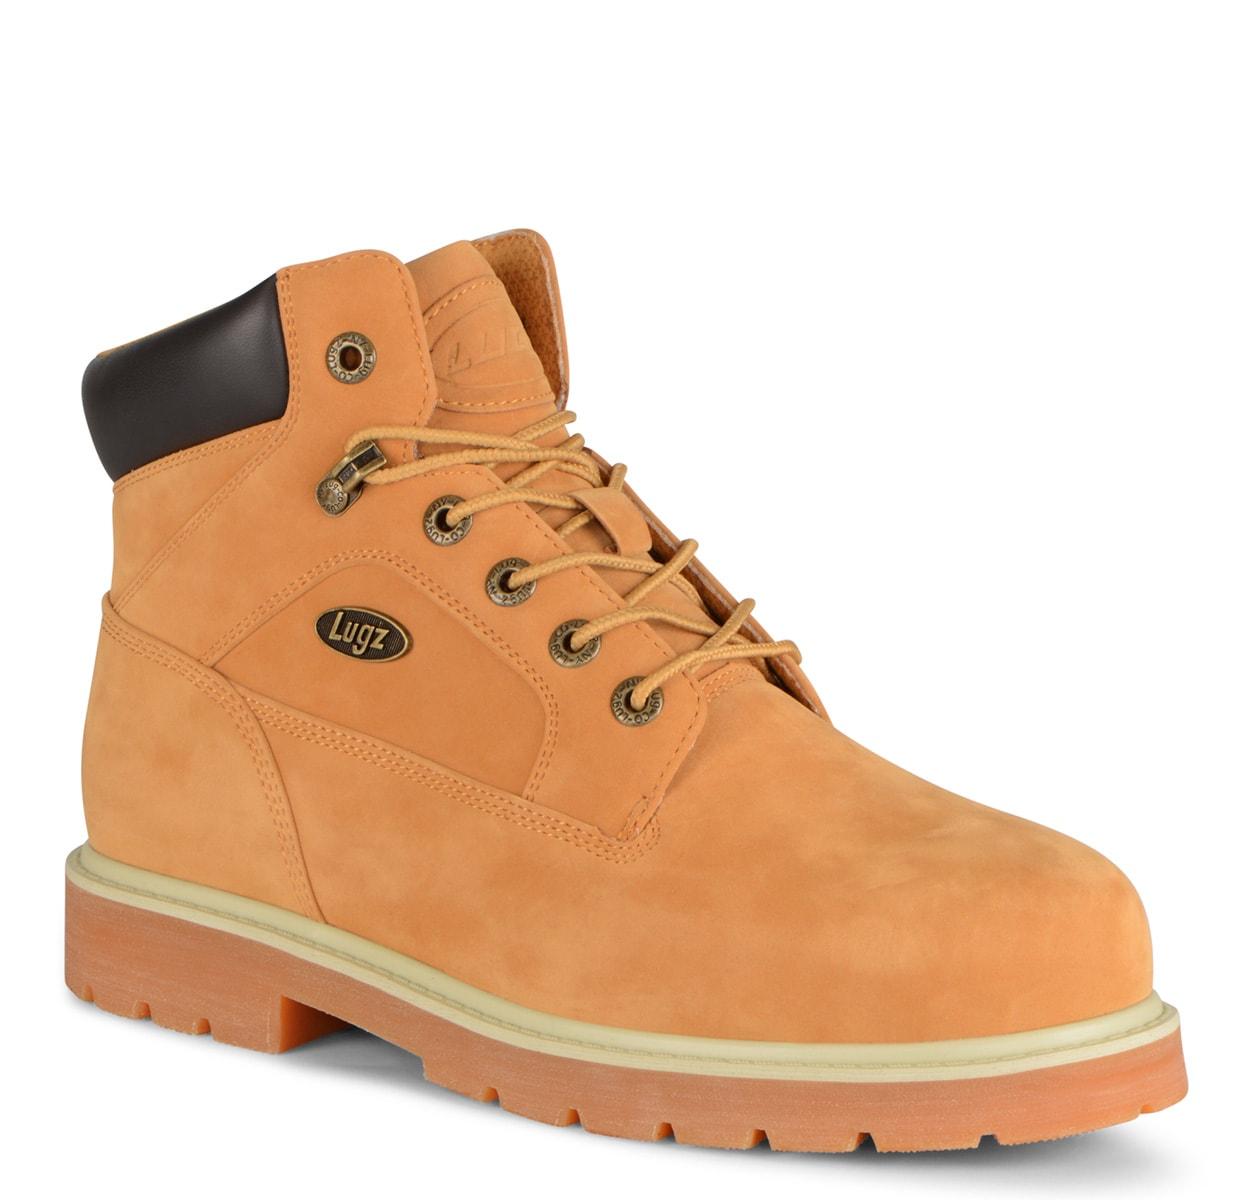 Men's Mortar Mid Steel Toe Chukka Boot (Choose Your Color: GOLDEN WHEAT/BARK/CREAM, Choose Your Size: 8.0)